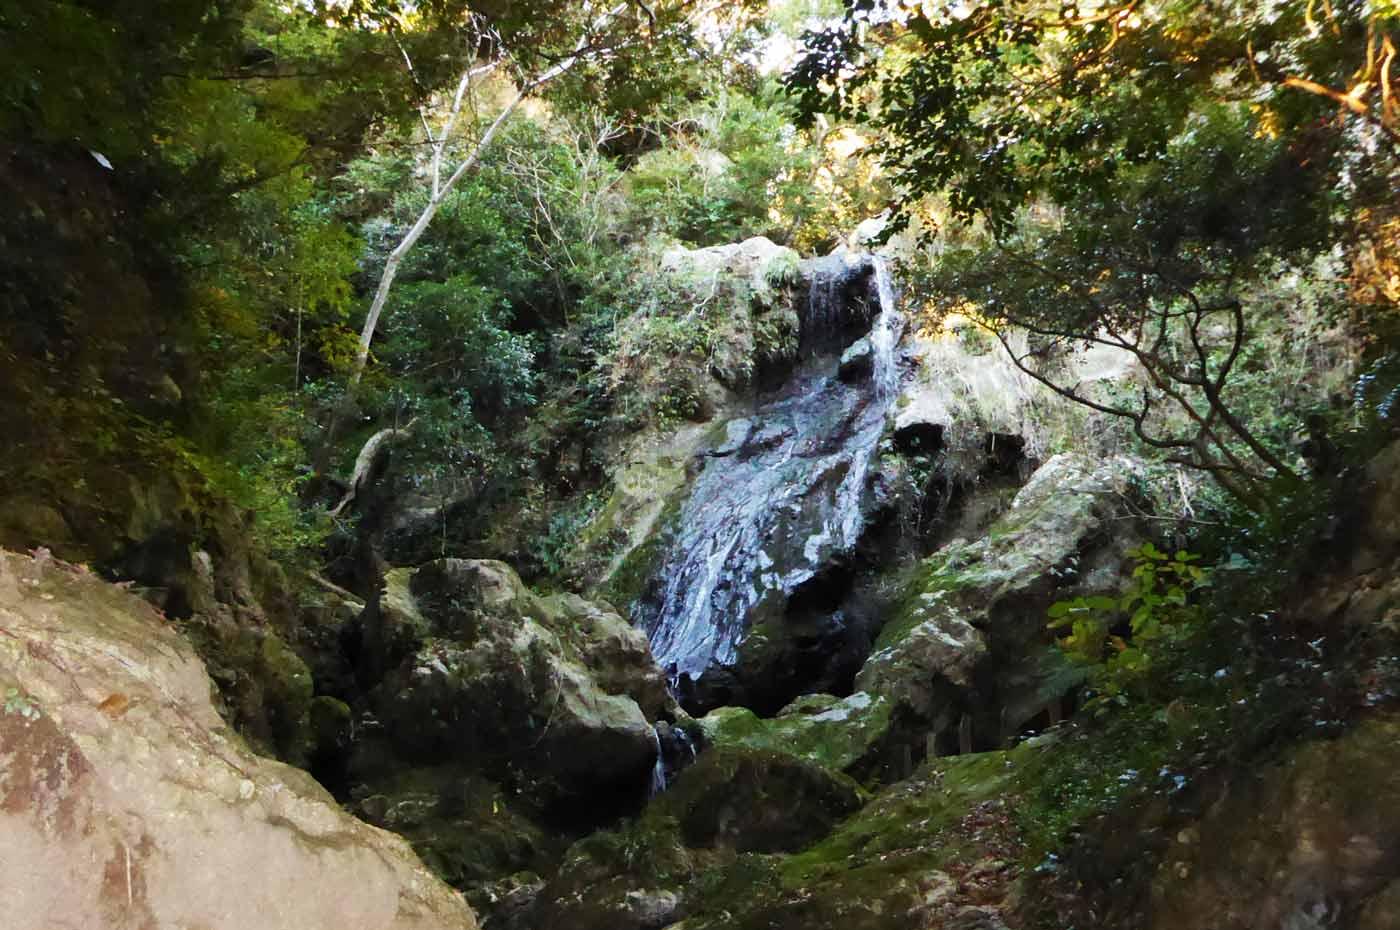 岩屋山波切不動の不動滝